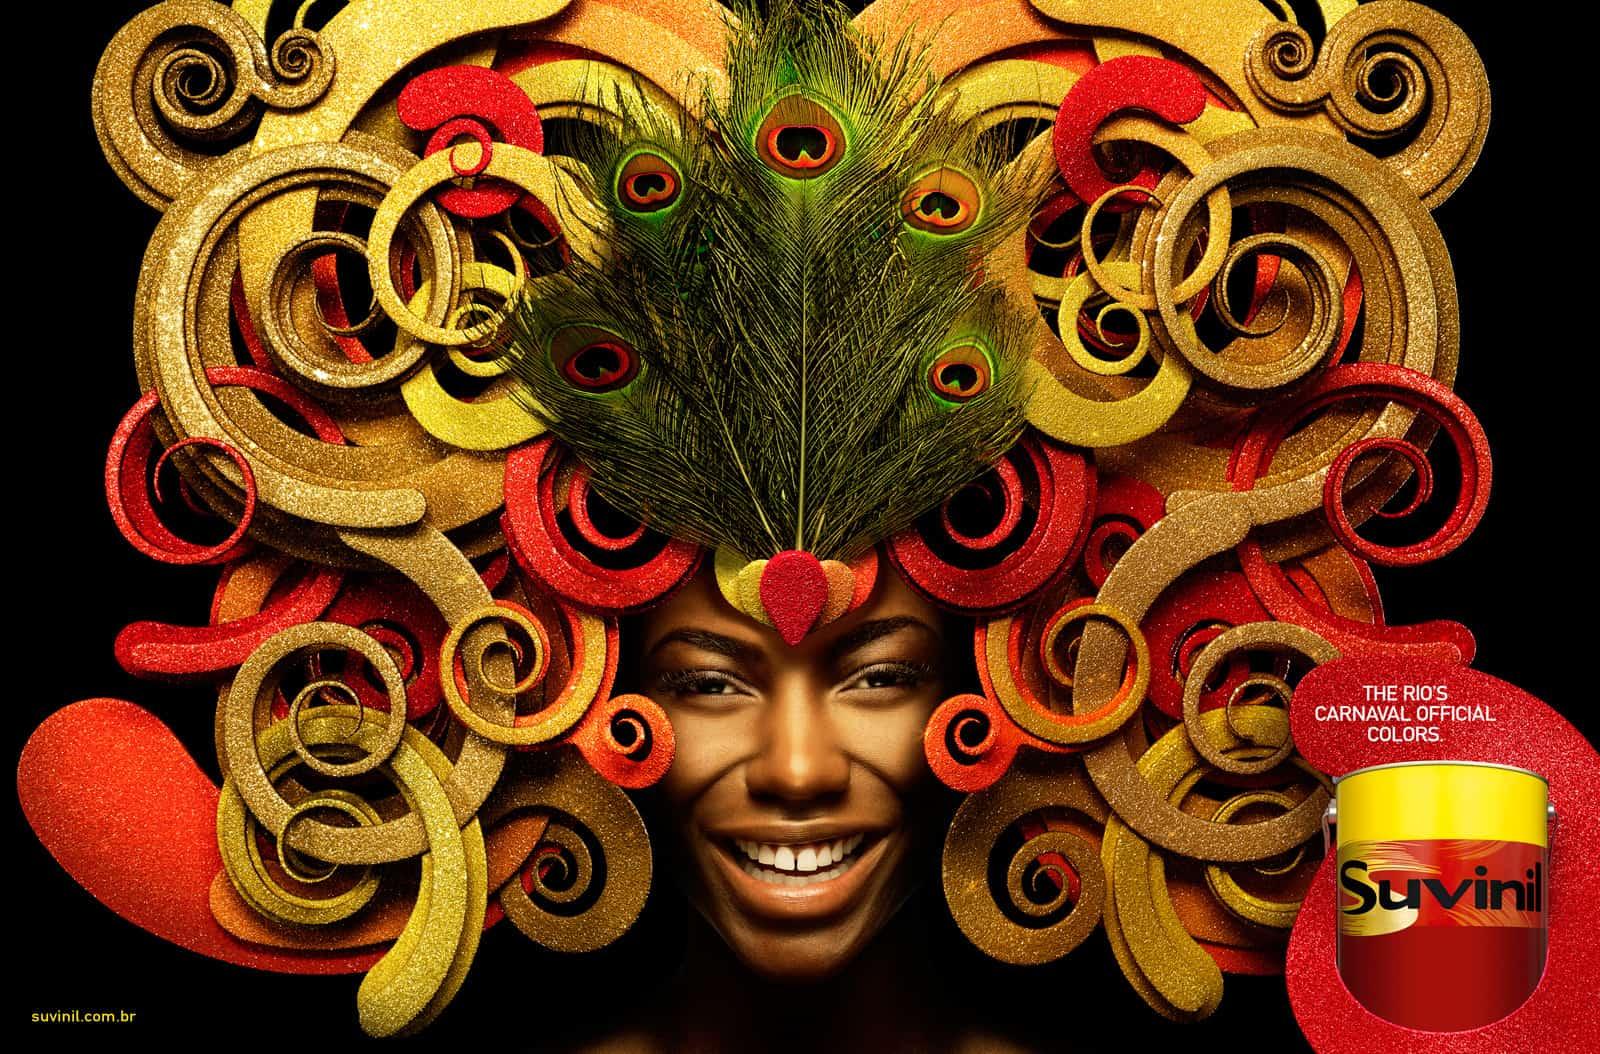 Suvinil : Carnaval de Rio